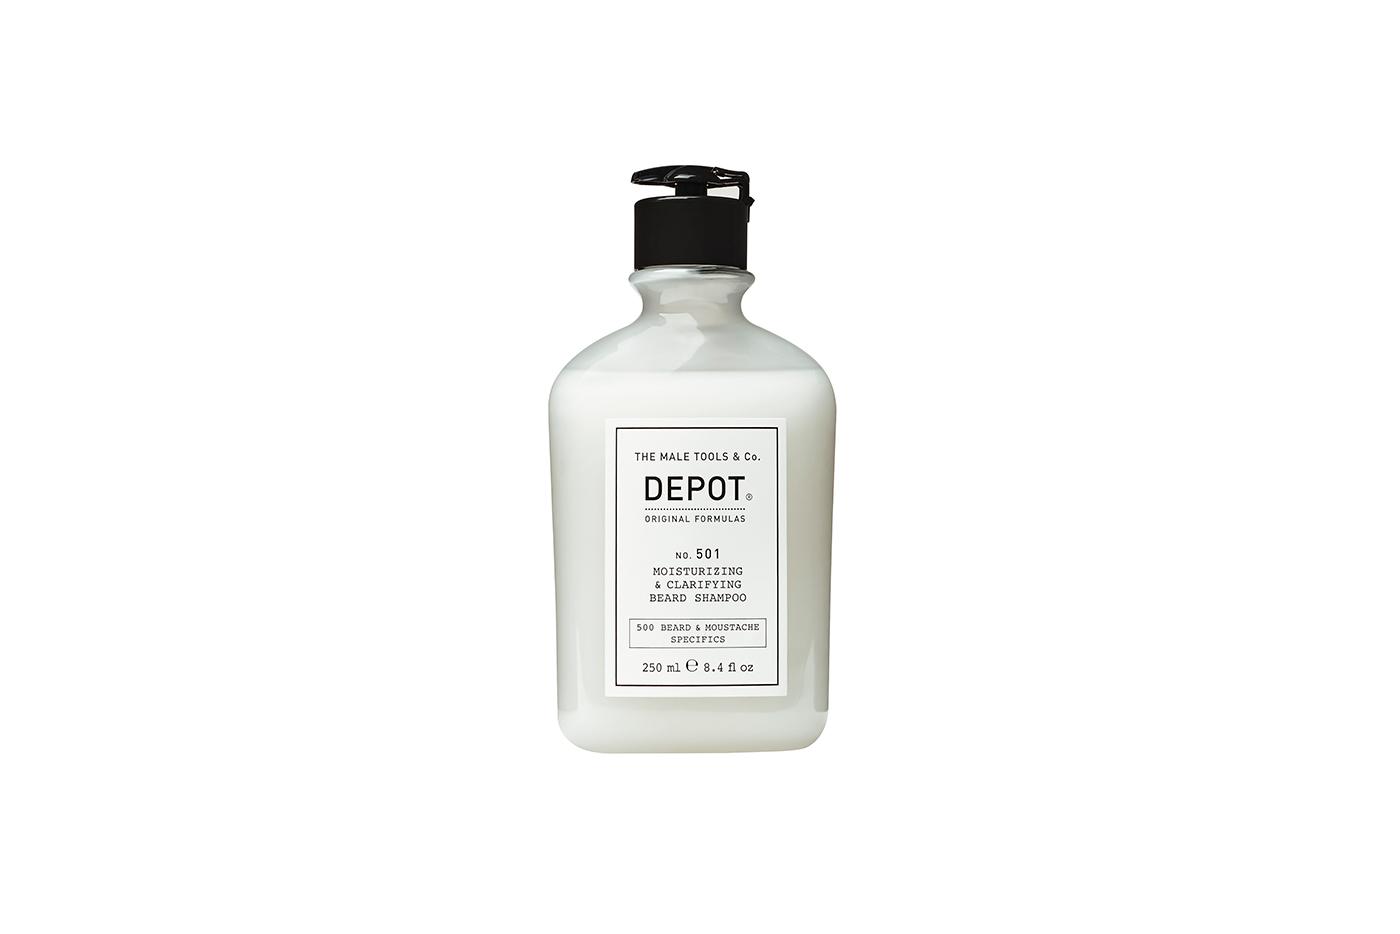 Depot No. 501 Moisturizing & Clarifying Beard Shampoo